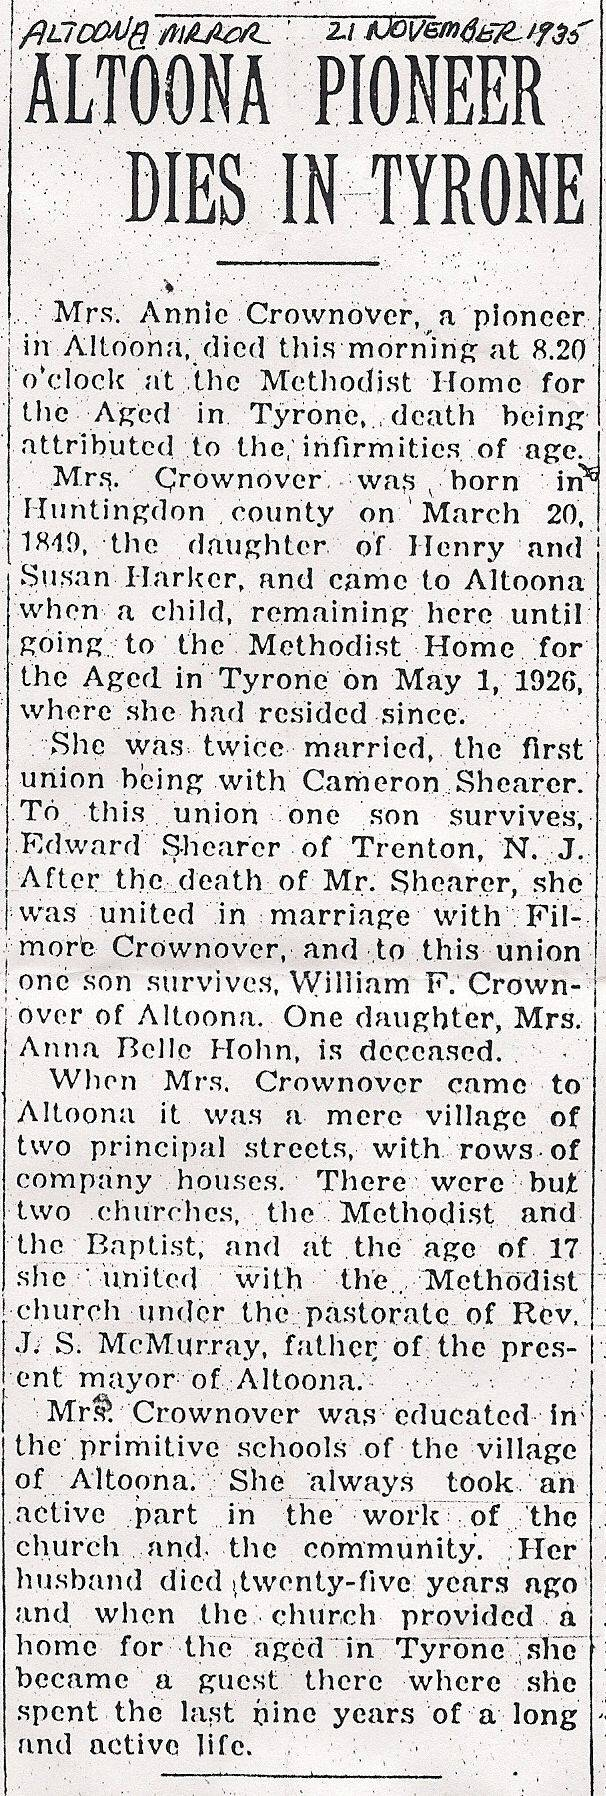 Crownover, Annie Harker 1935